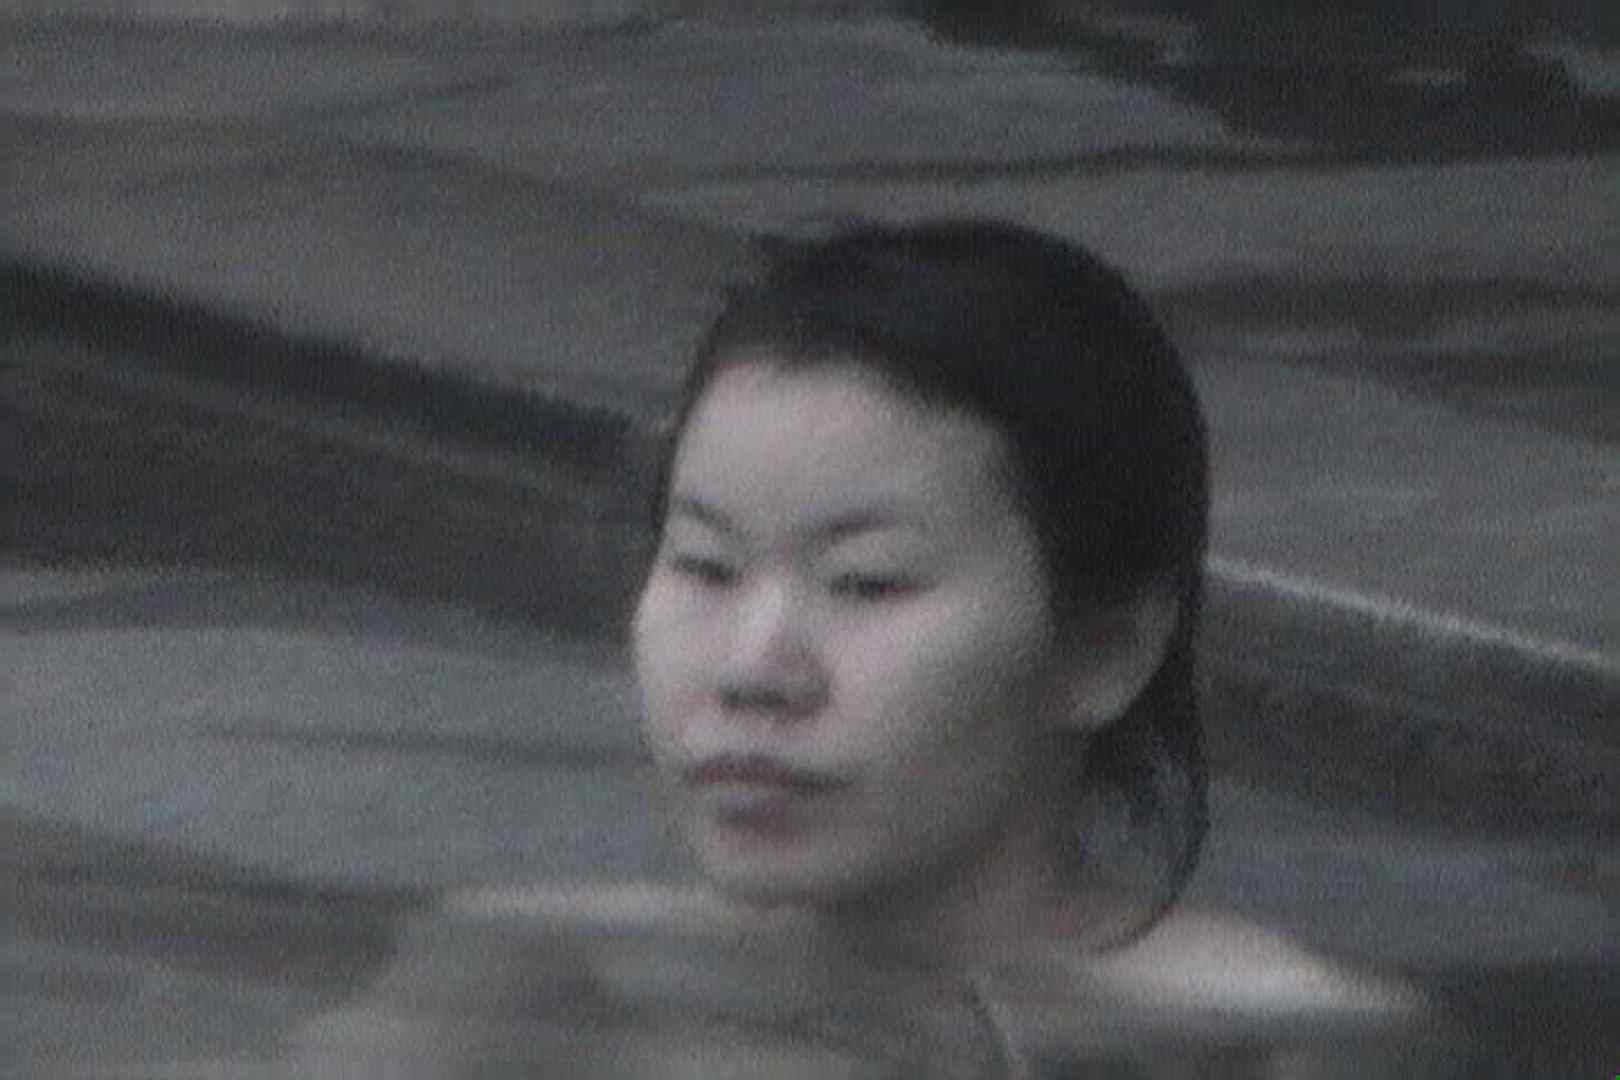 Aquaな露天風呂Vol.556 露天風呂編 | 盗撮シリーズ  99PIX 13